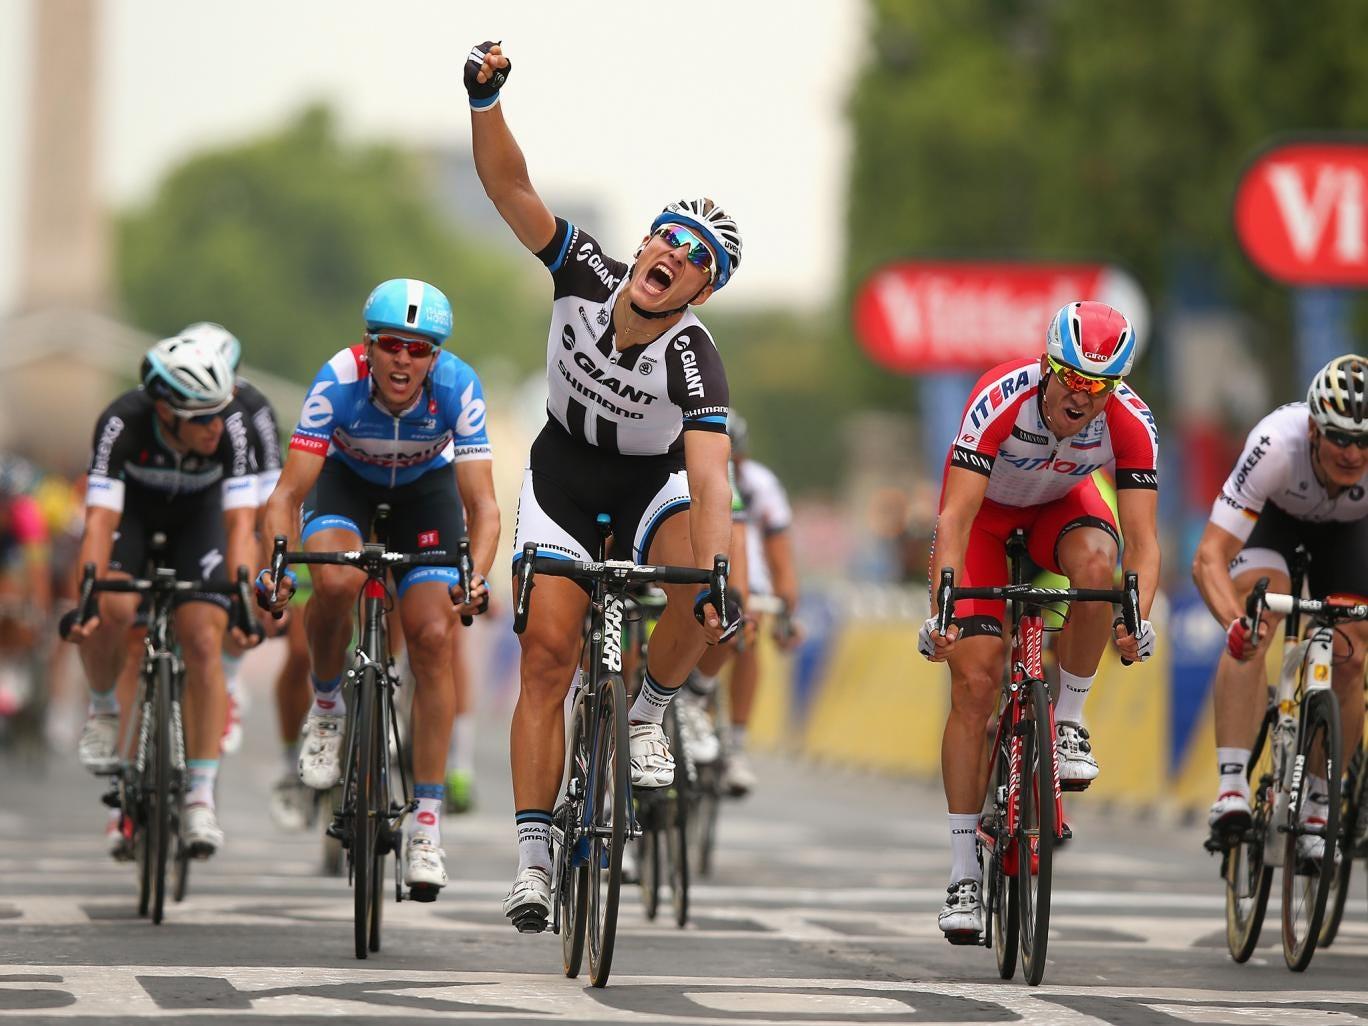 Tour de France 2014: Marcel Kittel wins final stage on ...